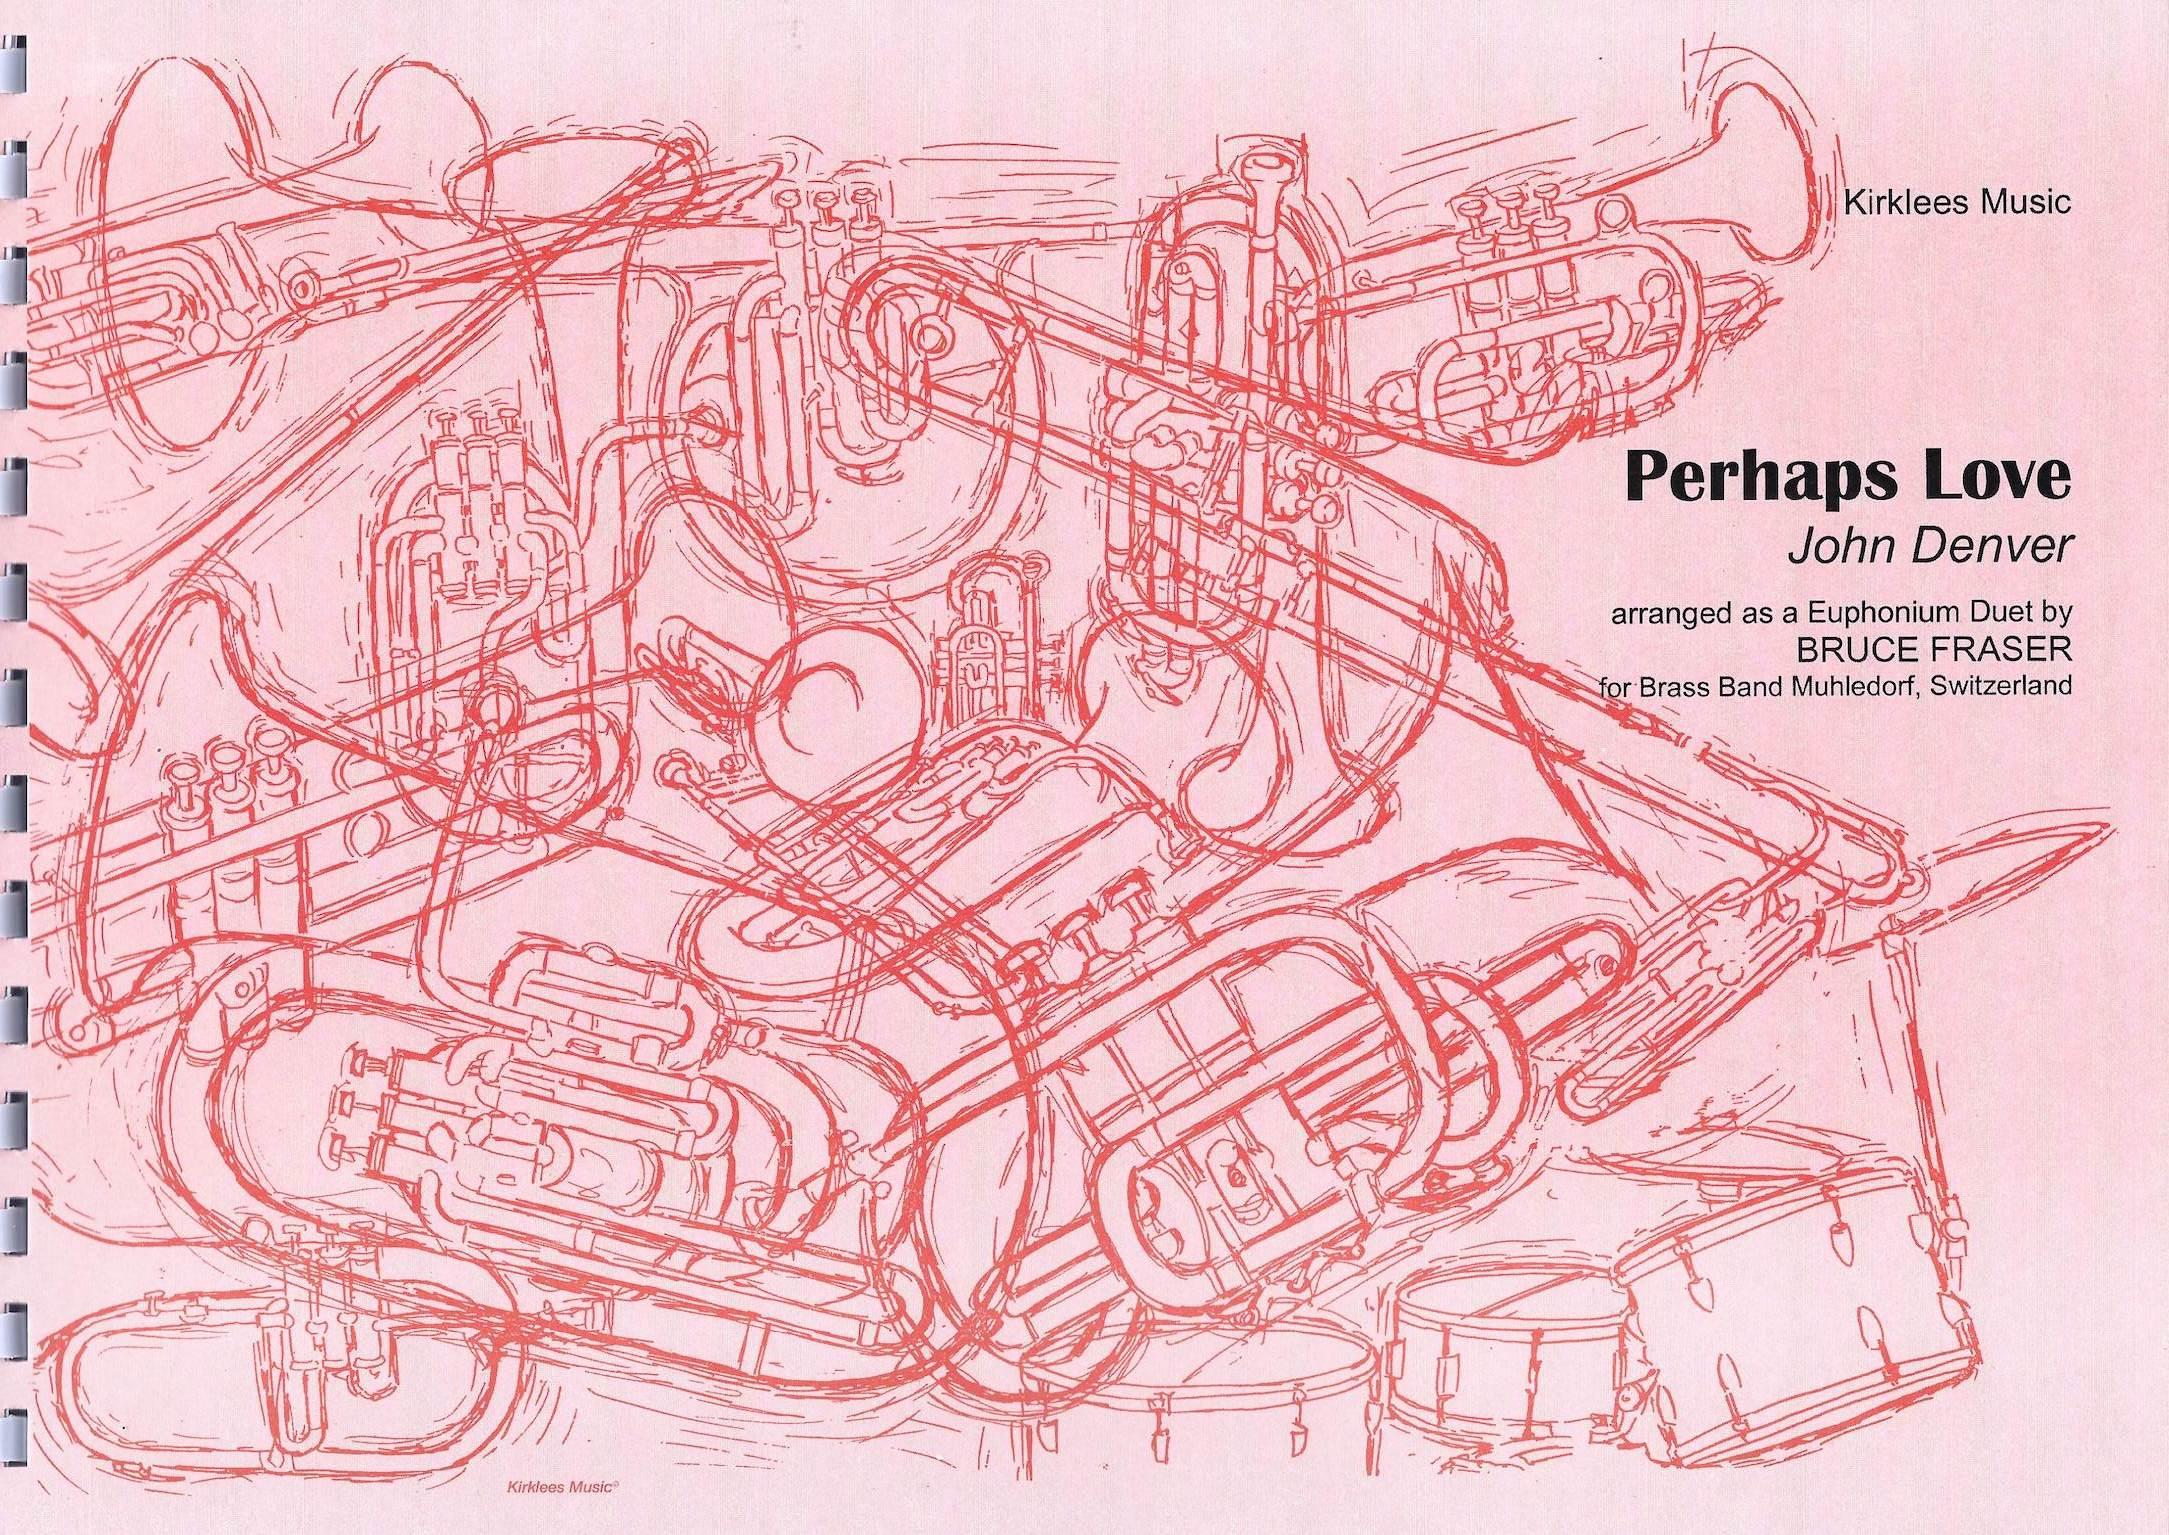 Perhaps Love - John Denver Arr. B. Fraser - Euphonium Duet with brass band accompaniment